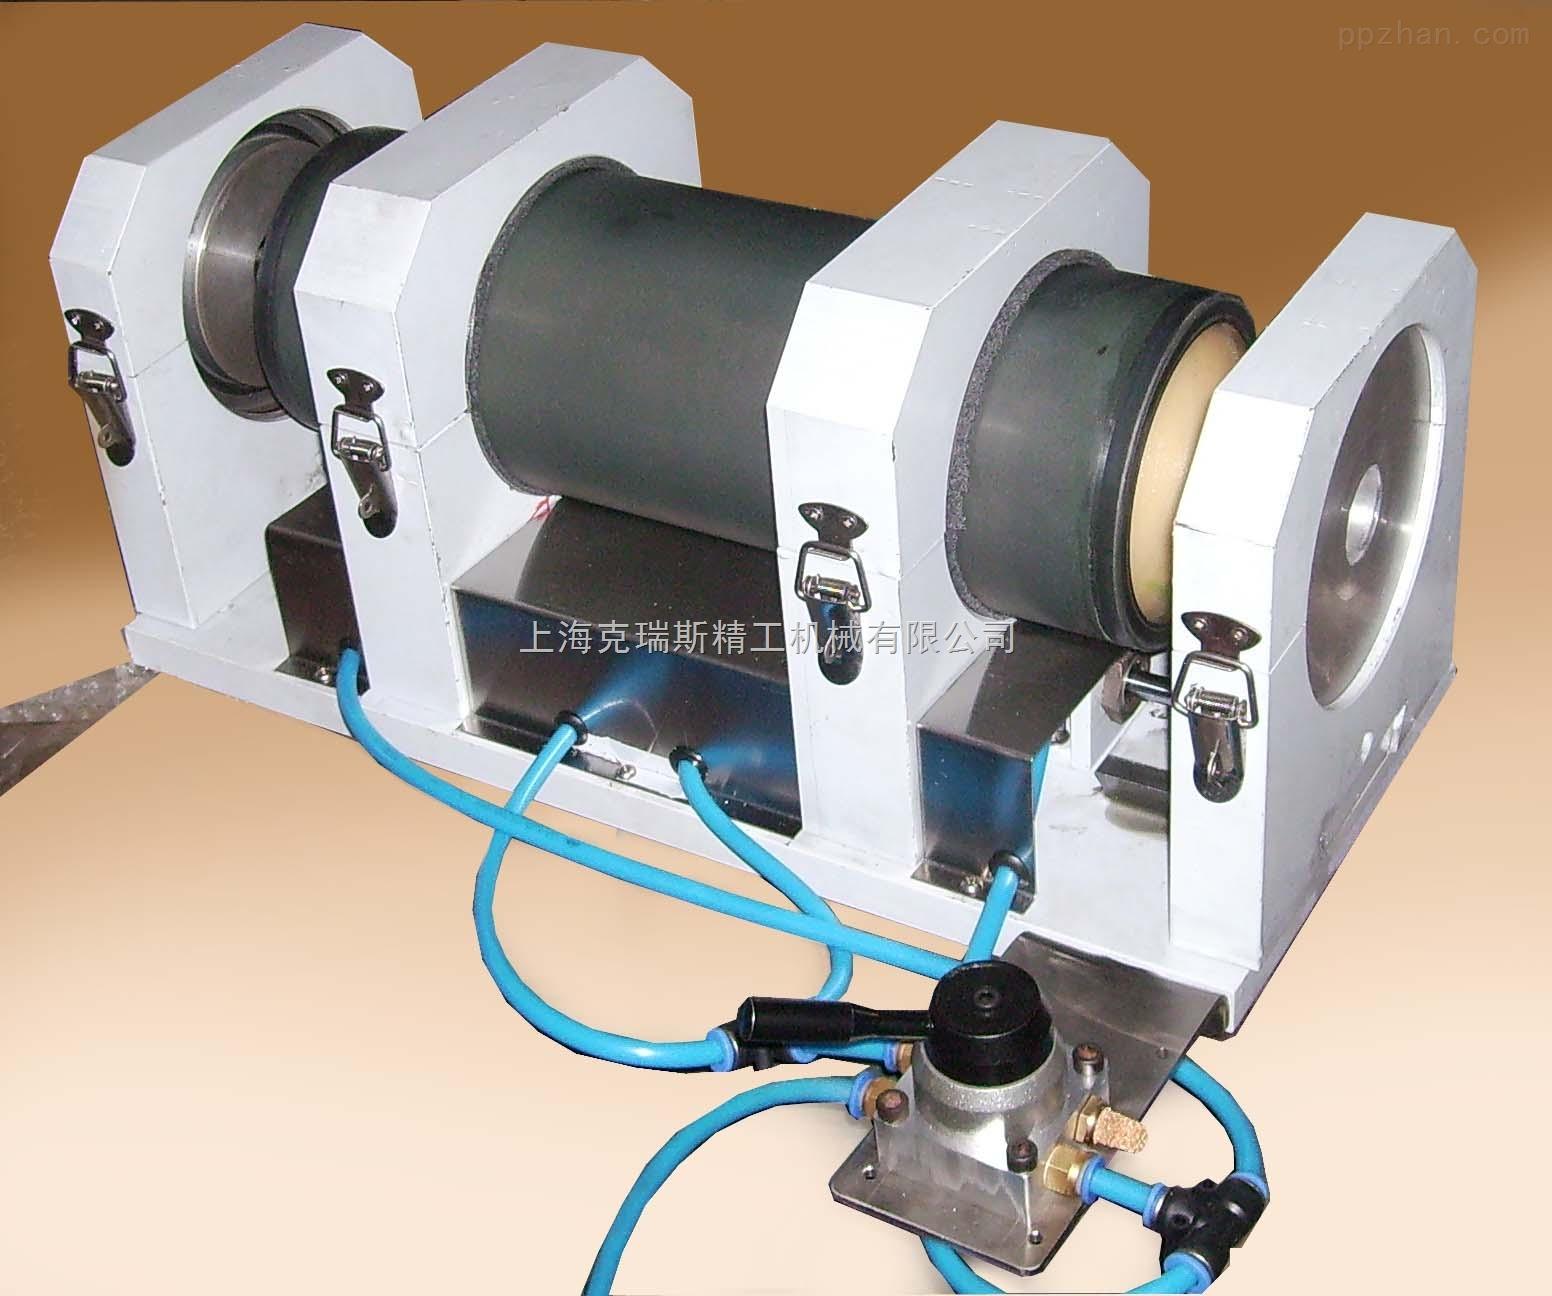 PSI/1R500T-套筒式�W�y�通�S�b卸器�r格